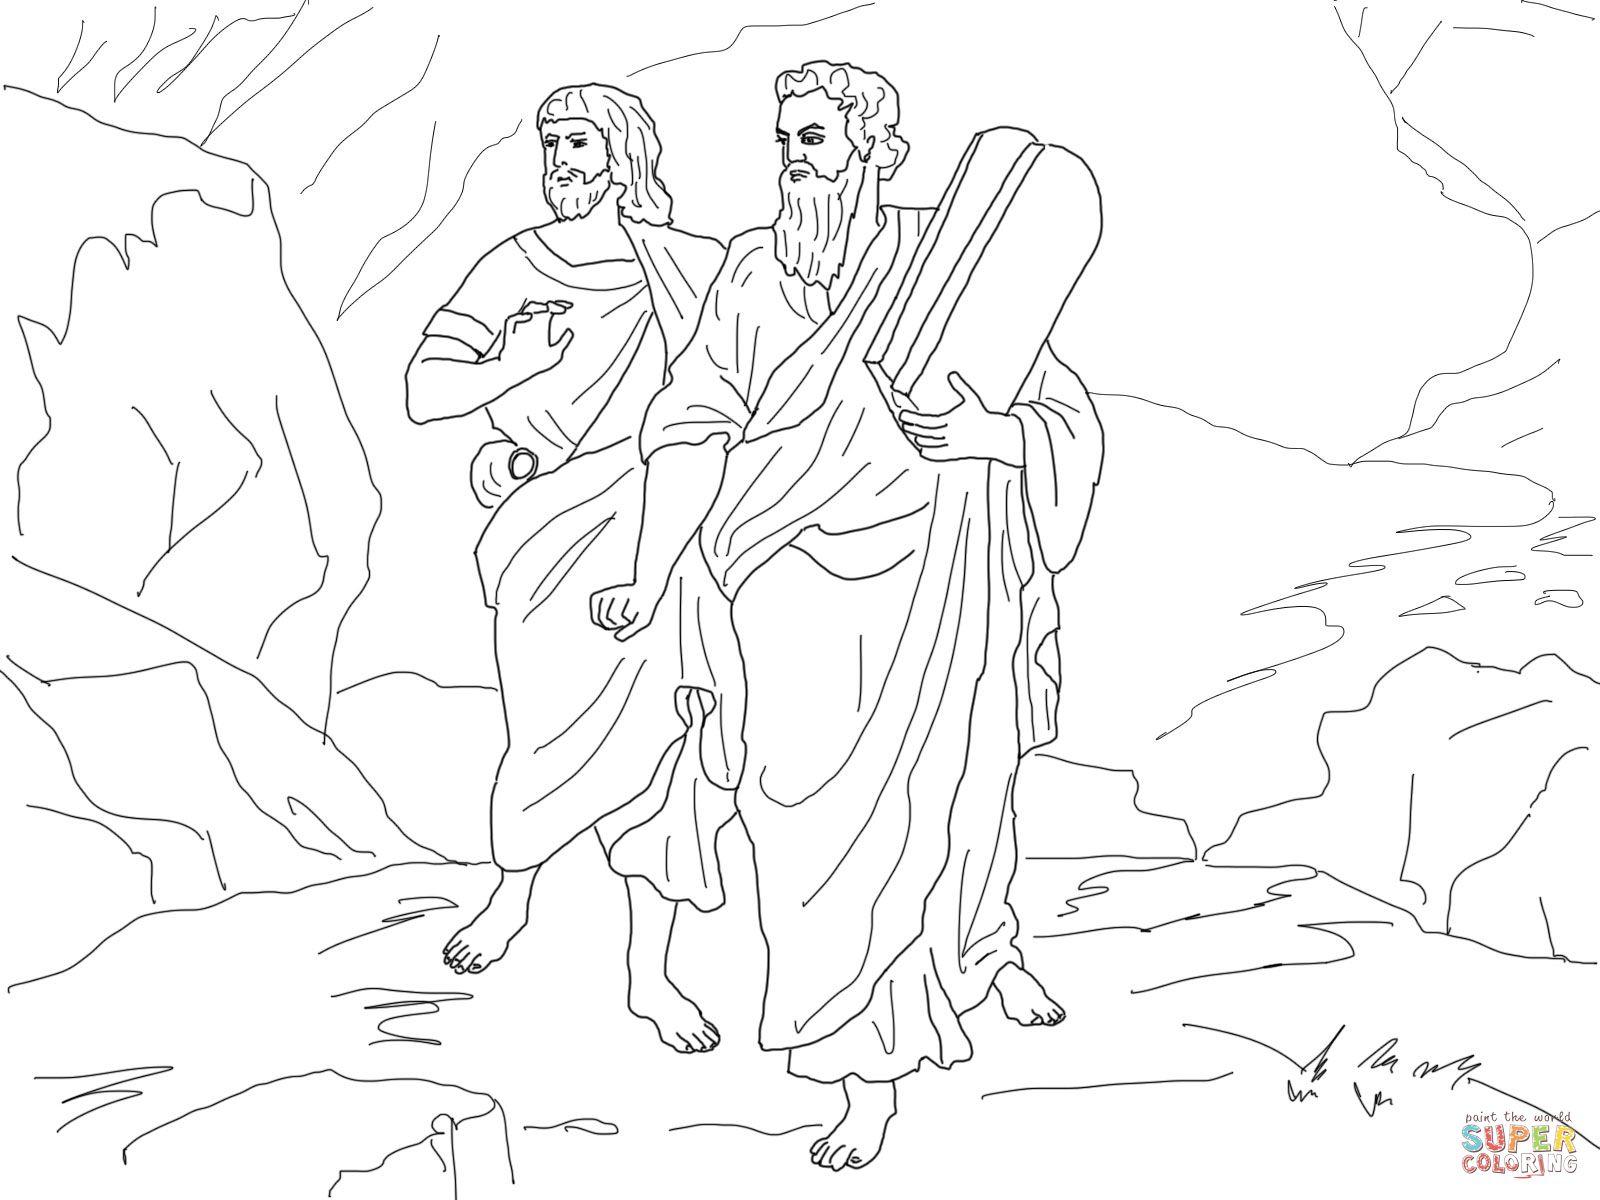 joshua coloring pages - Căutare Google | biblie copii | Pinterest